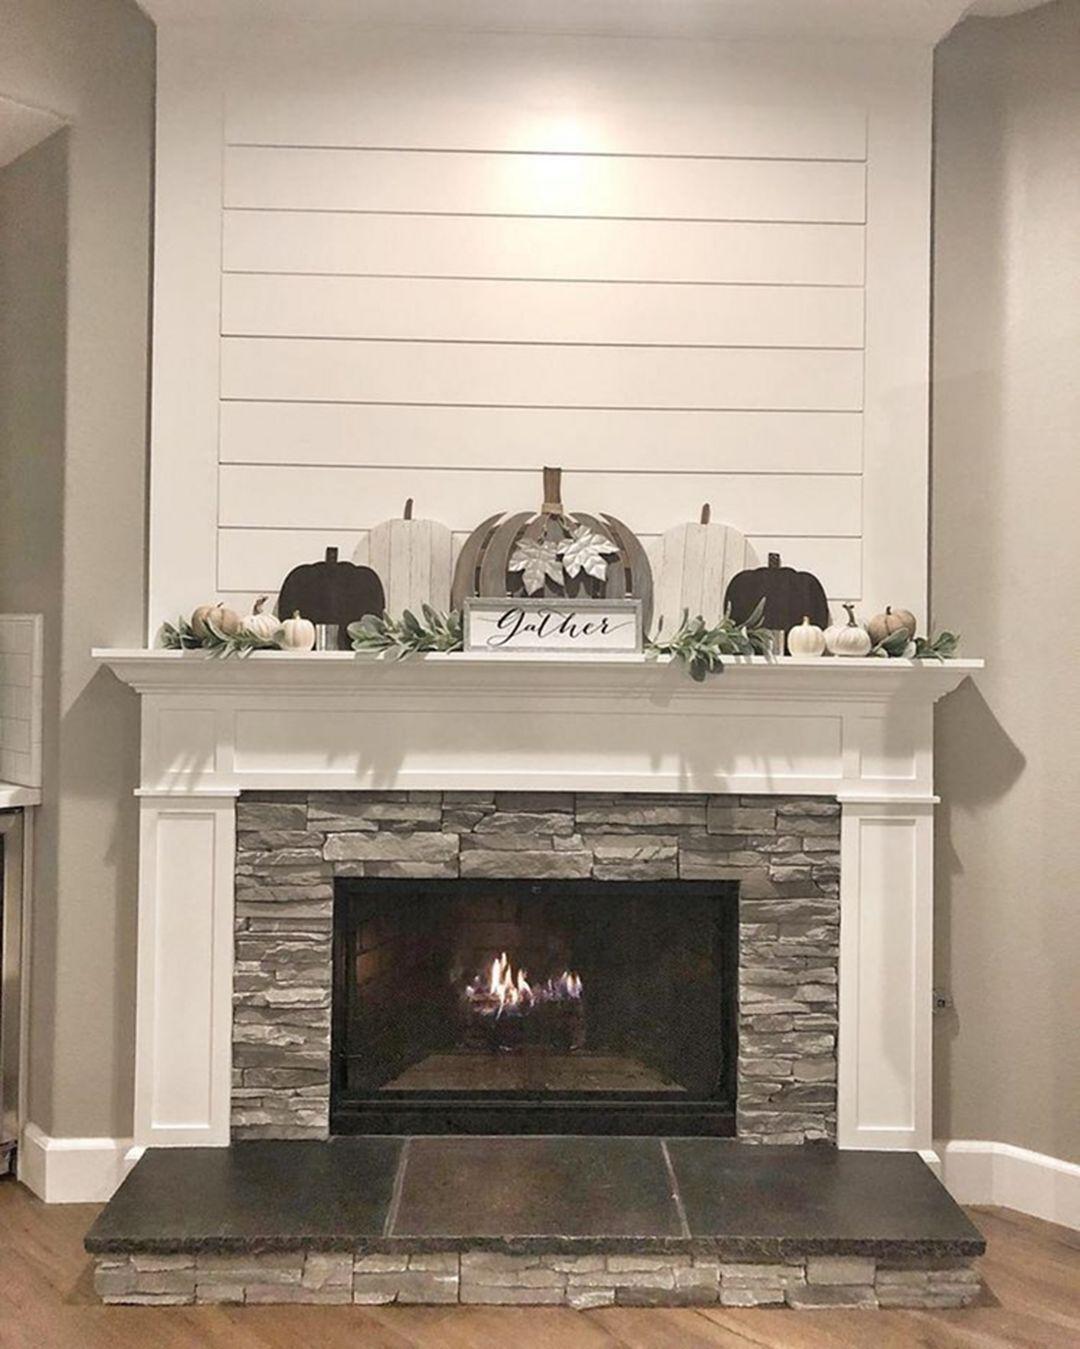 10 Beautiful Farmhouse Fireplace Mantel Decorations That Will